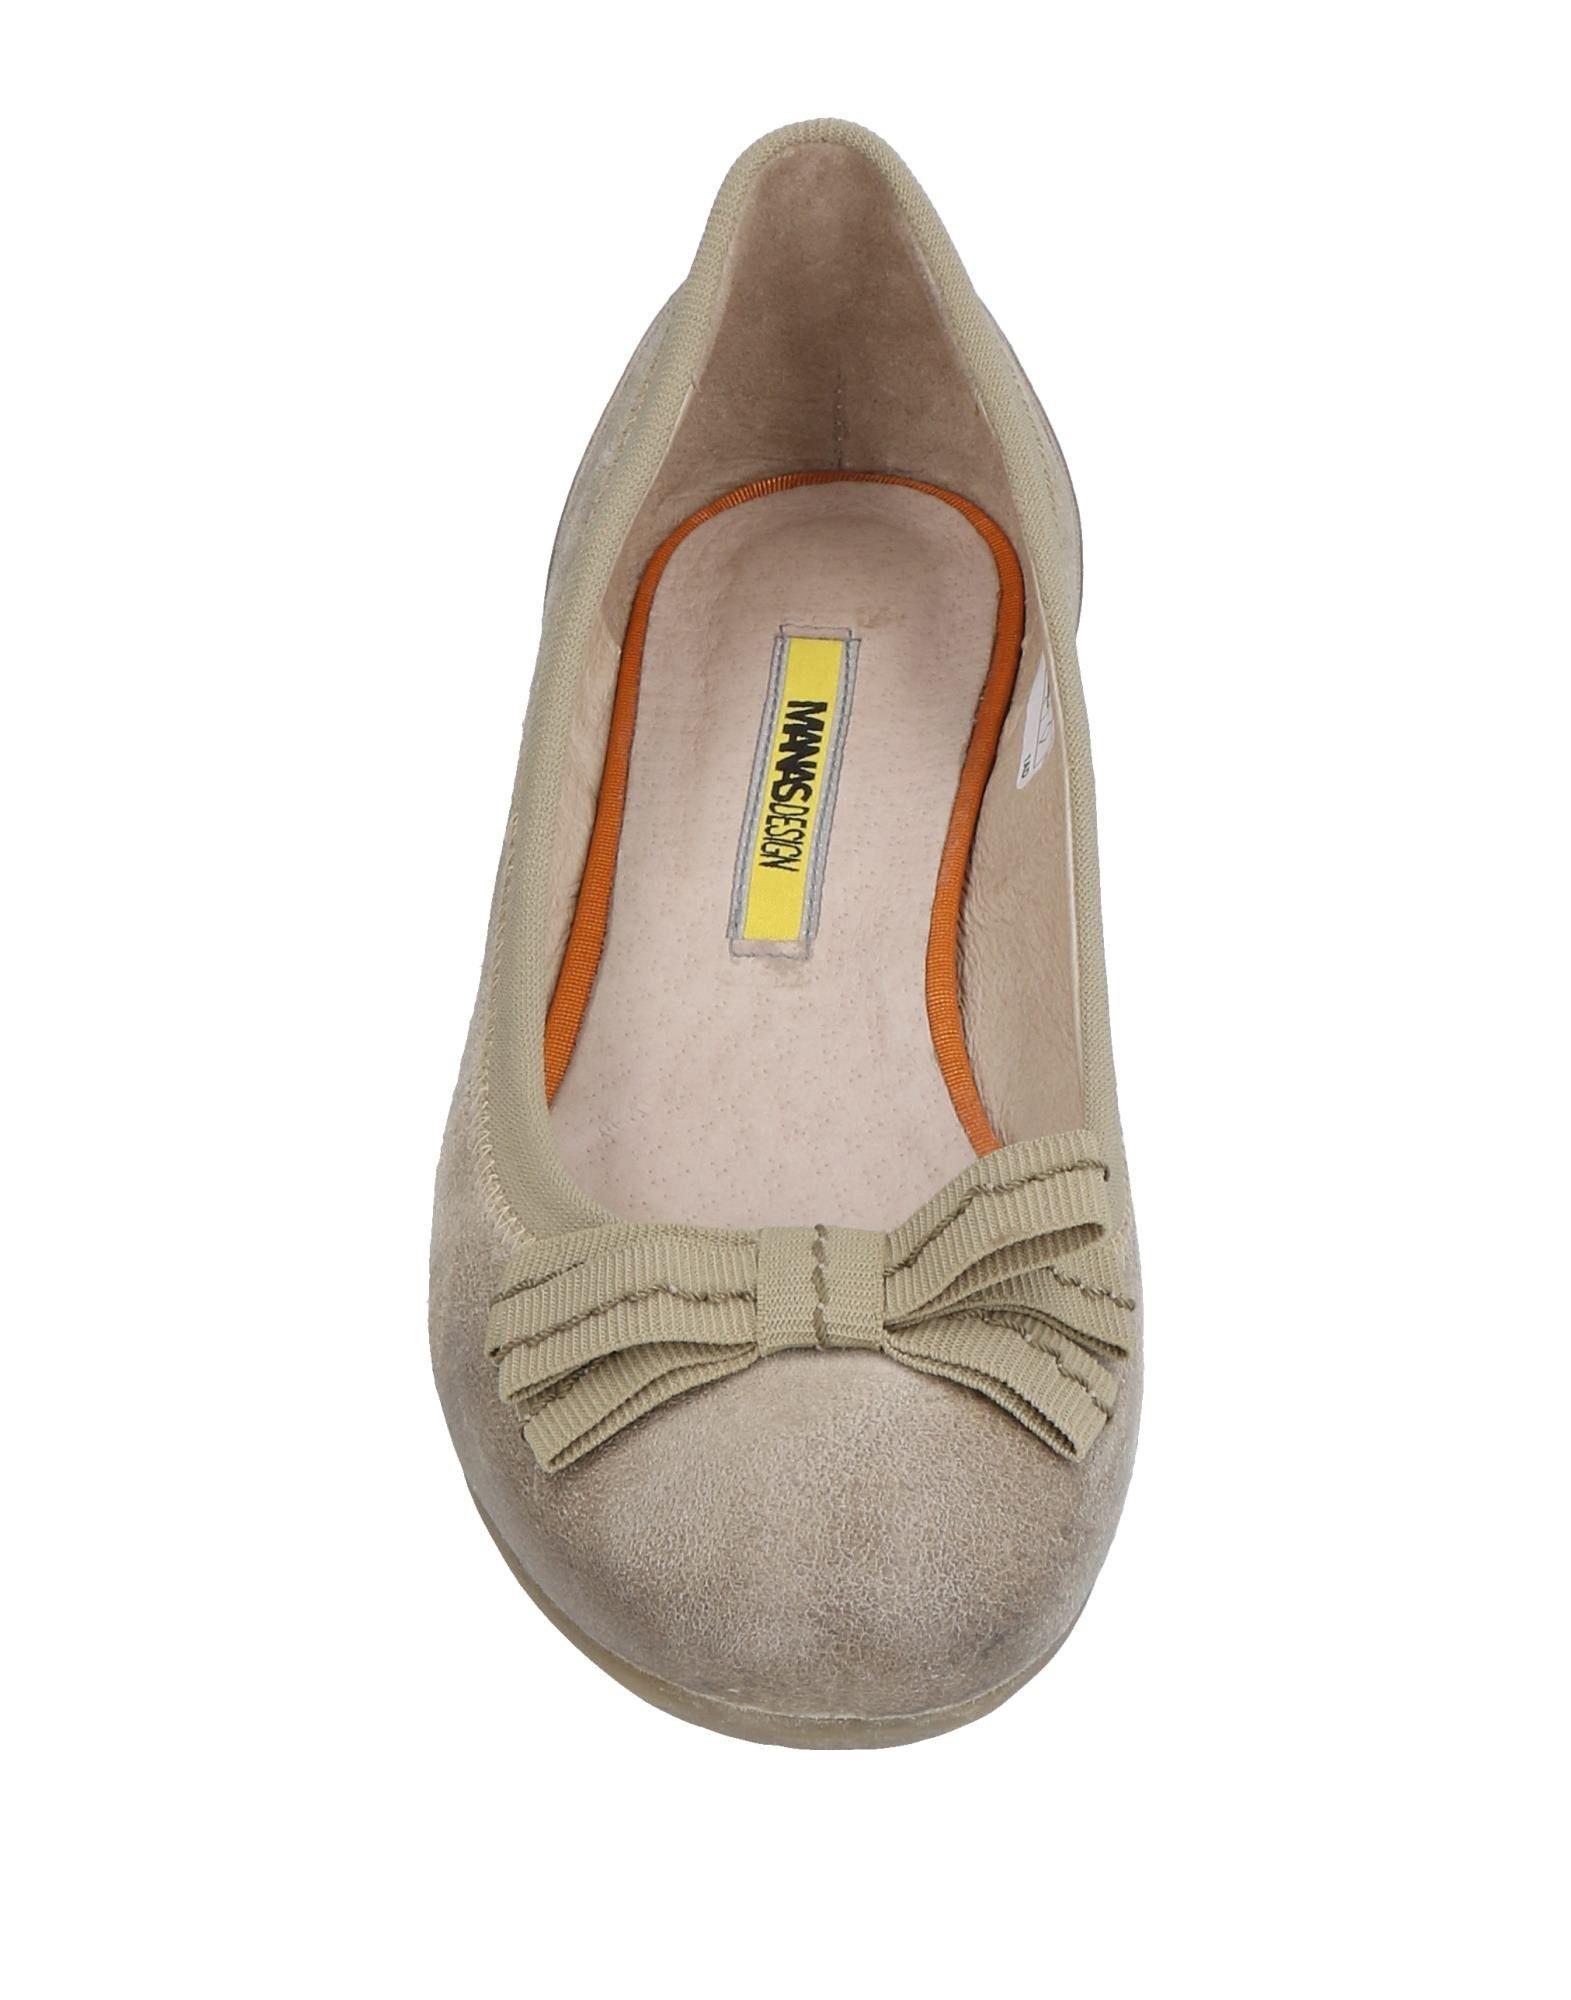 Schuhe Manas Ballerinas Damen  11505875PR Heiße Schuhe  82f9d8